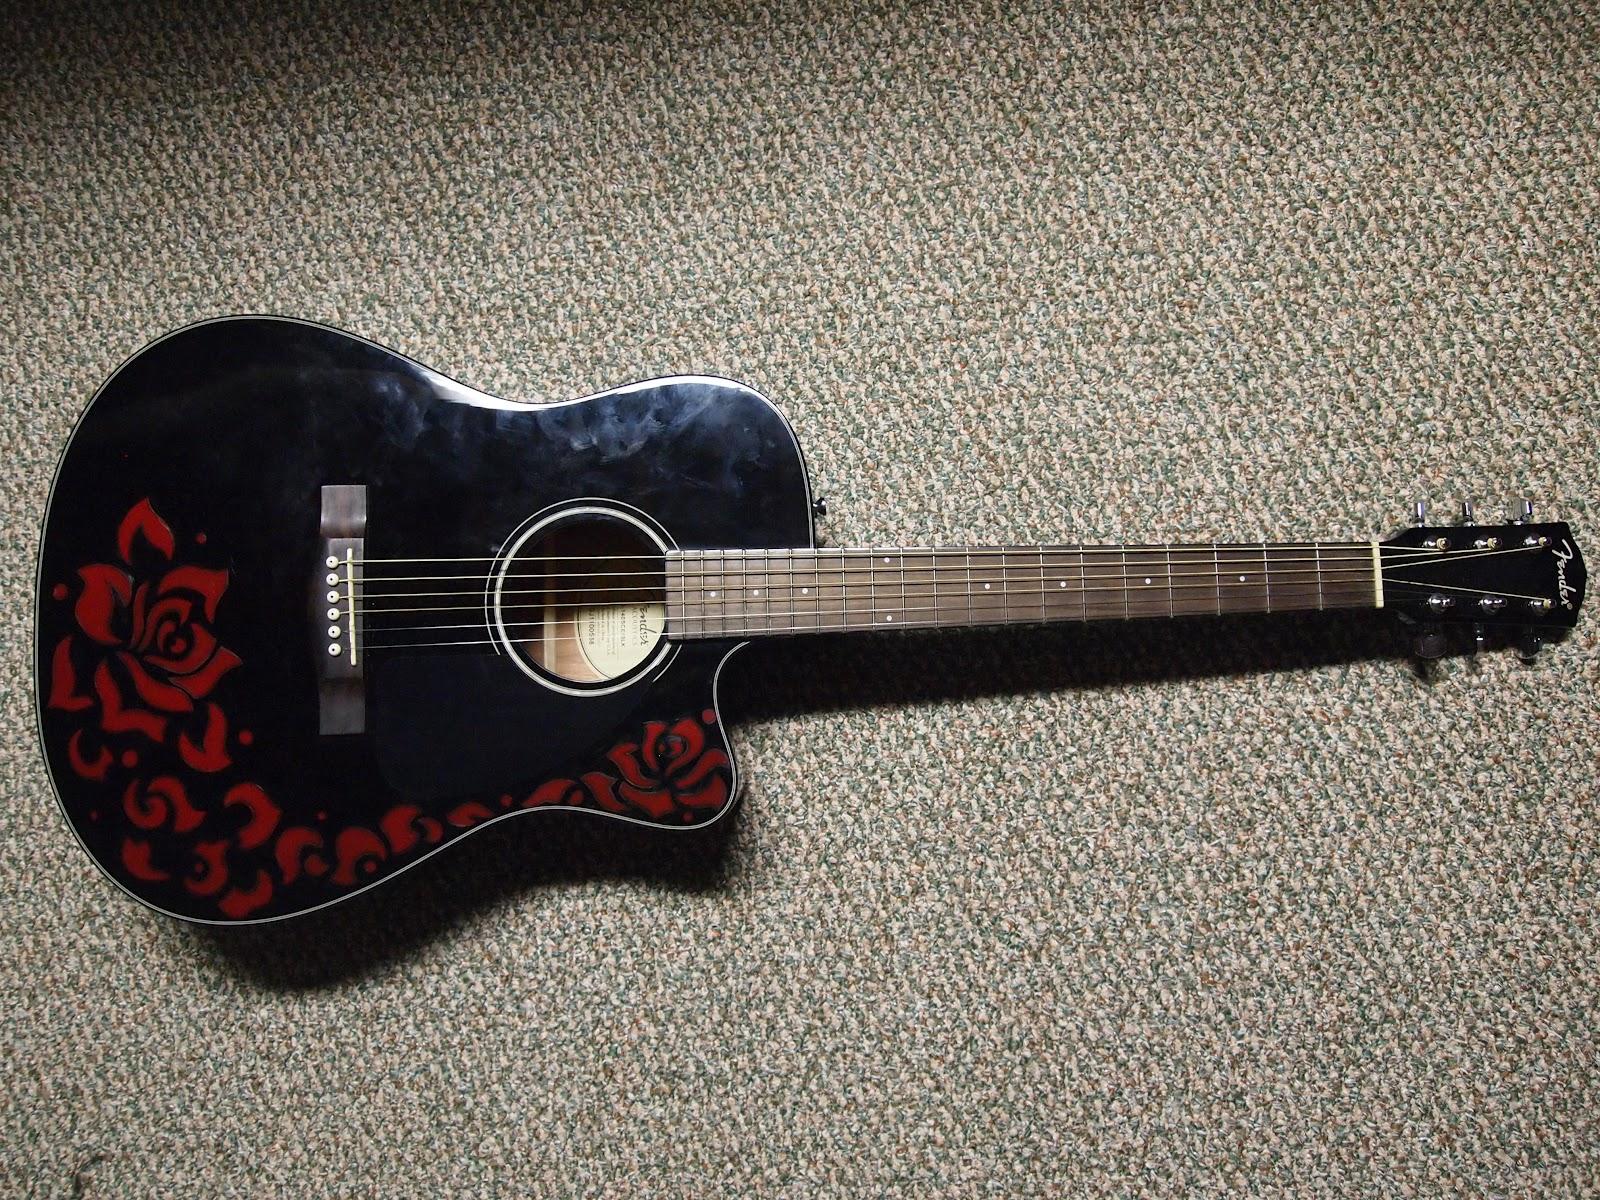 calypso guitar designs rose fender acoustic